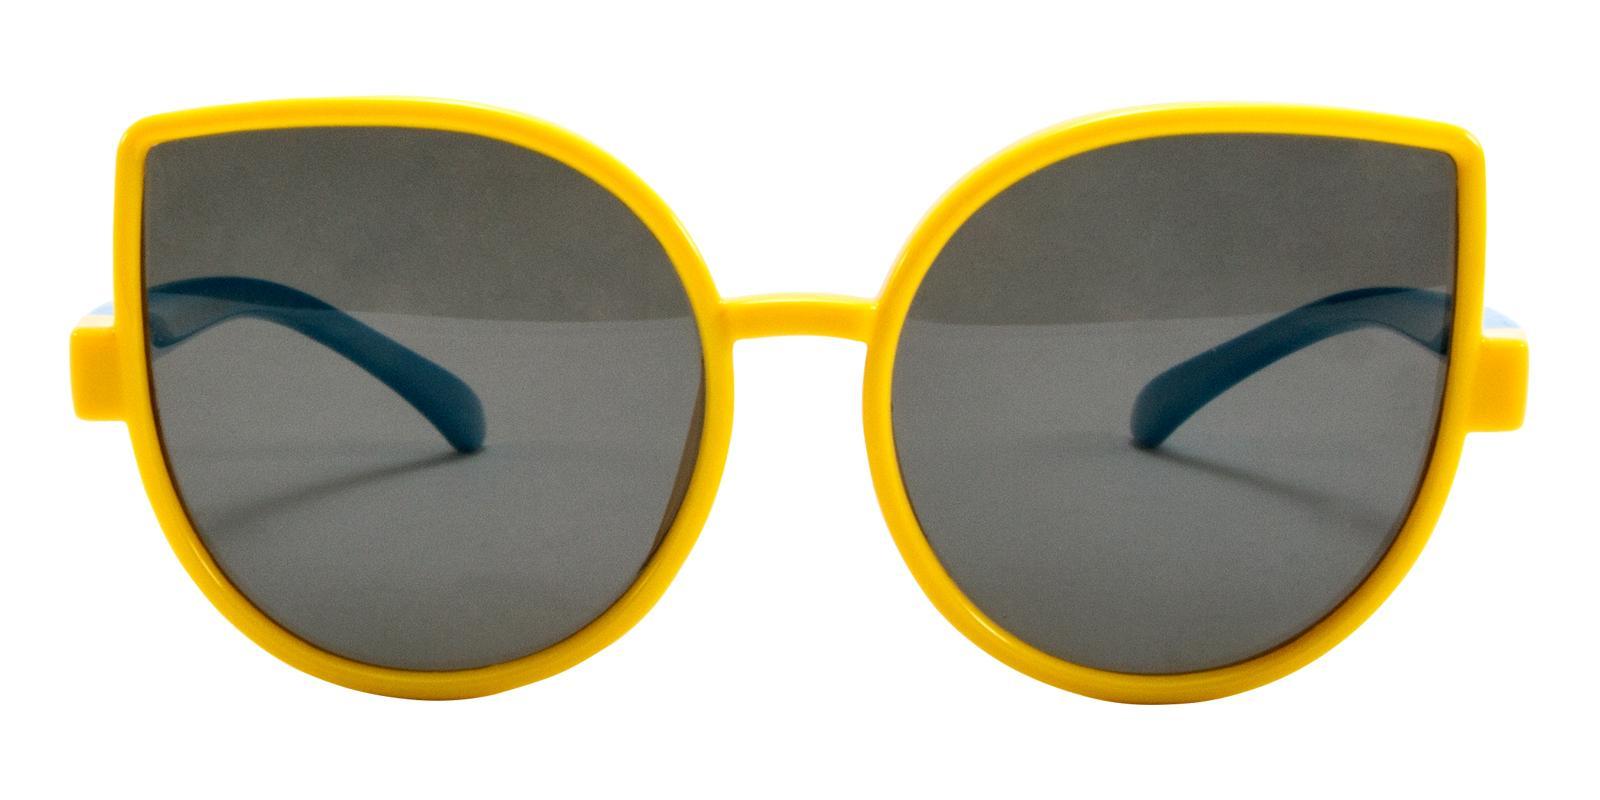 Blader Yellow TR Sunglasses , UniversalBridgeFit Frames from ABBE Glasses